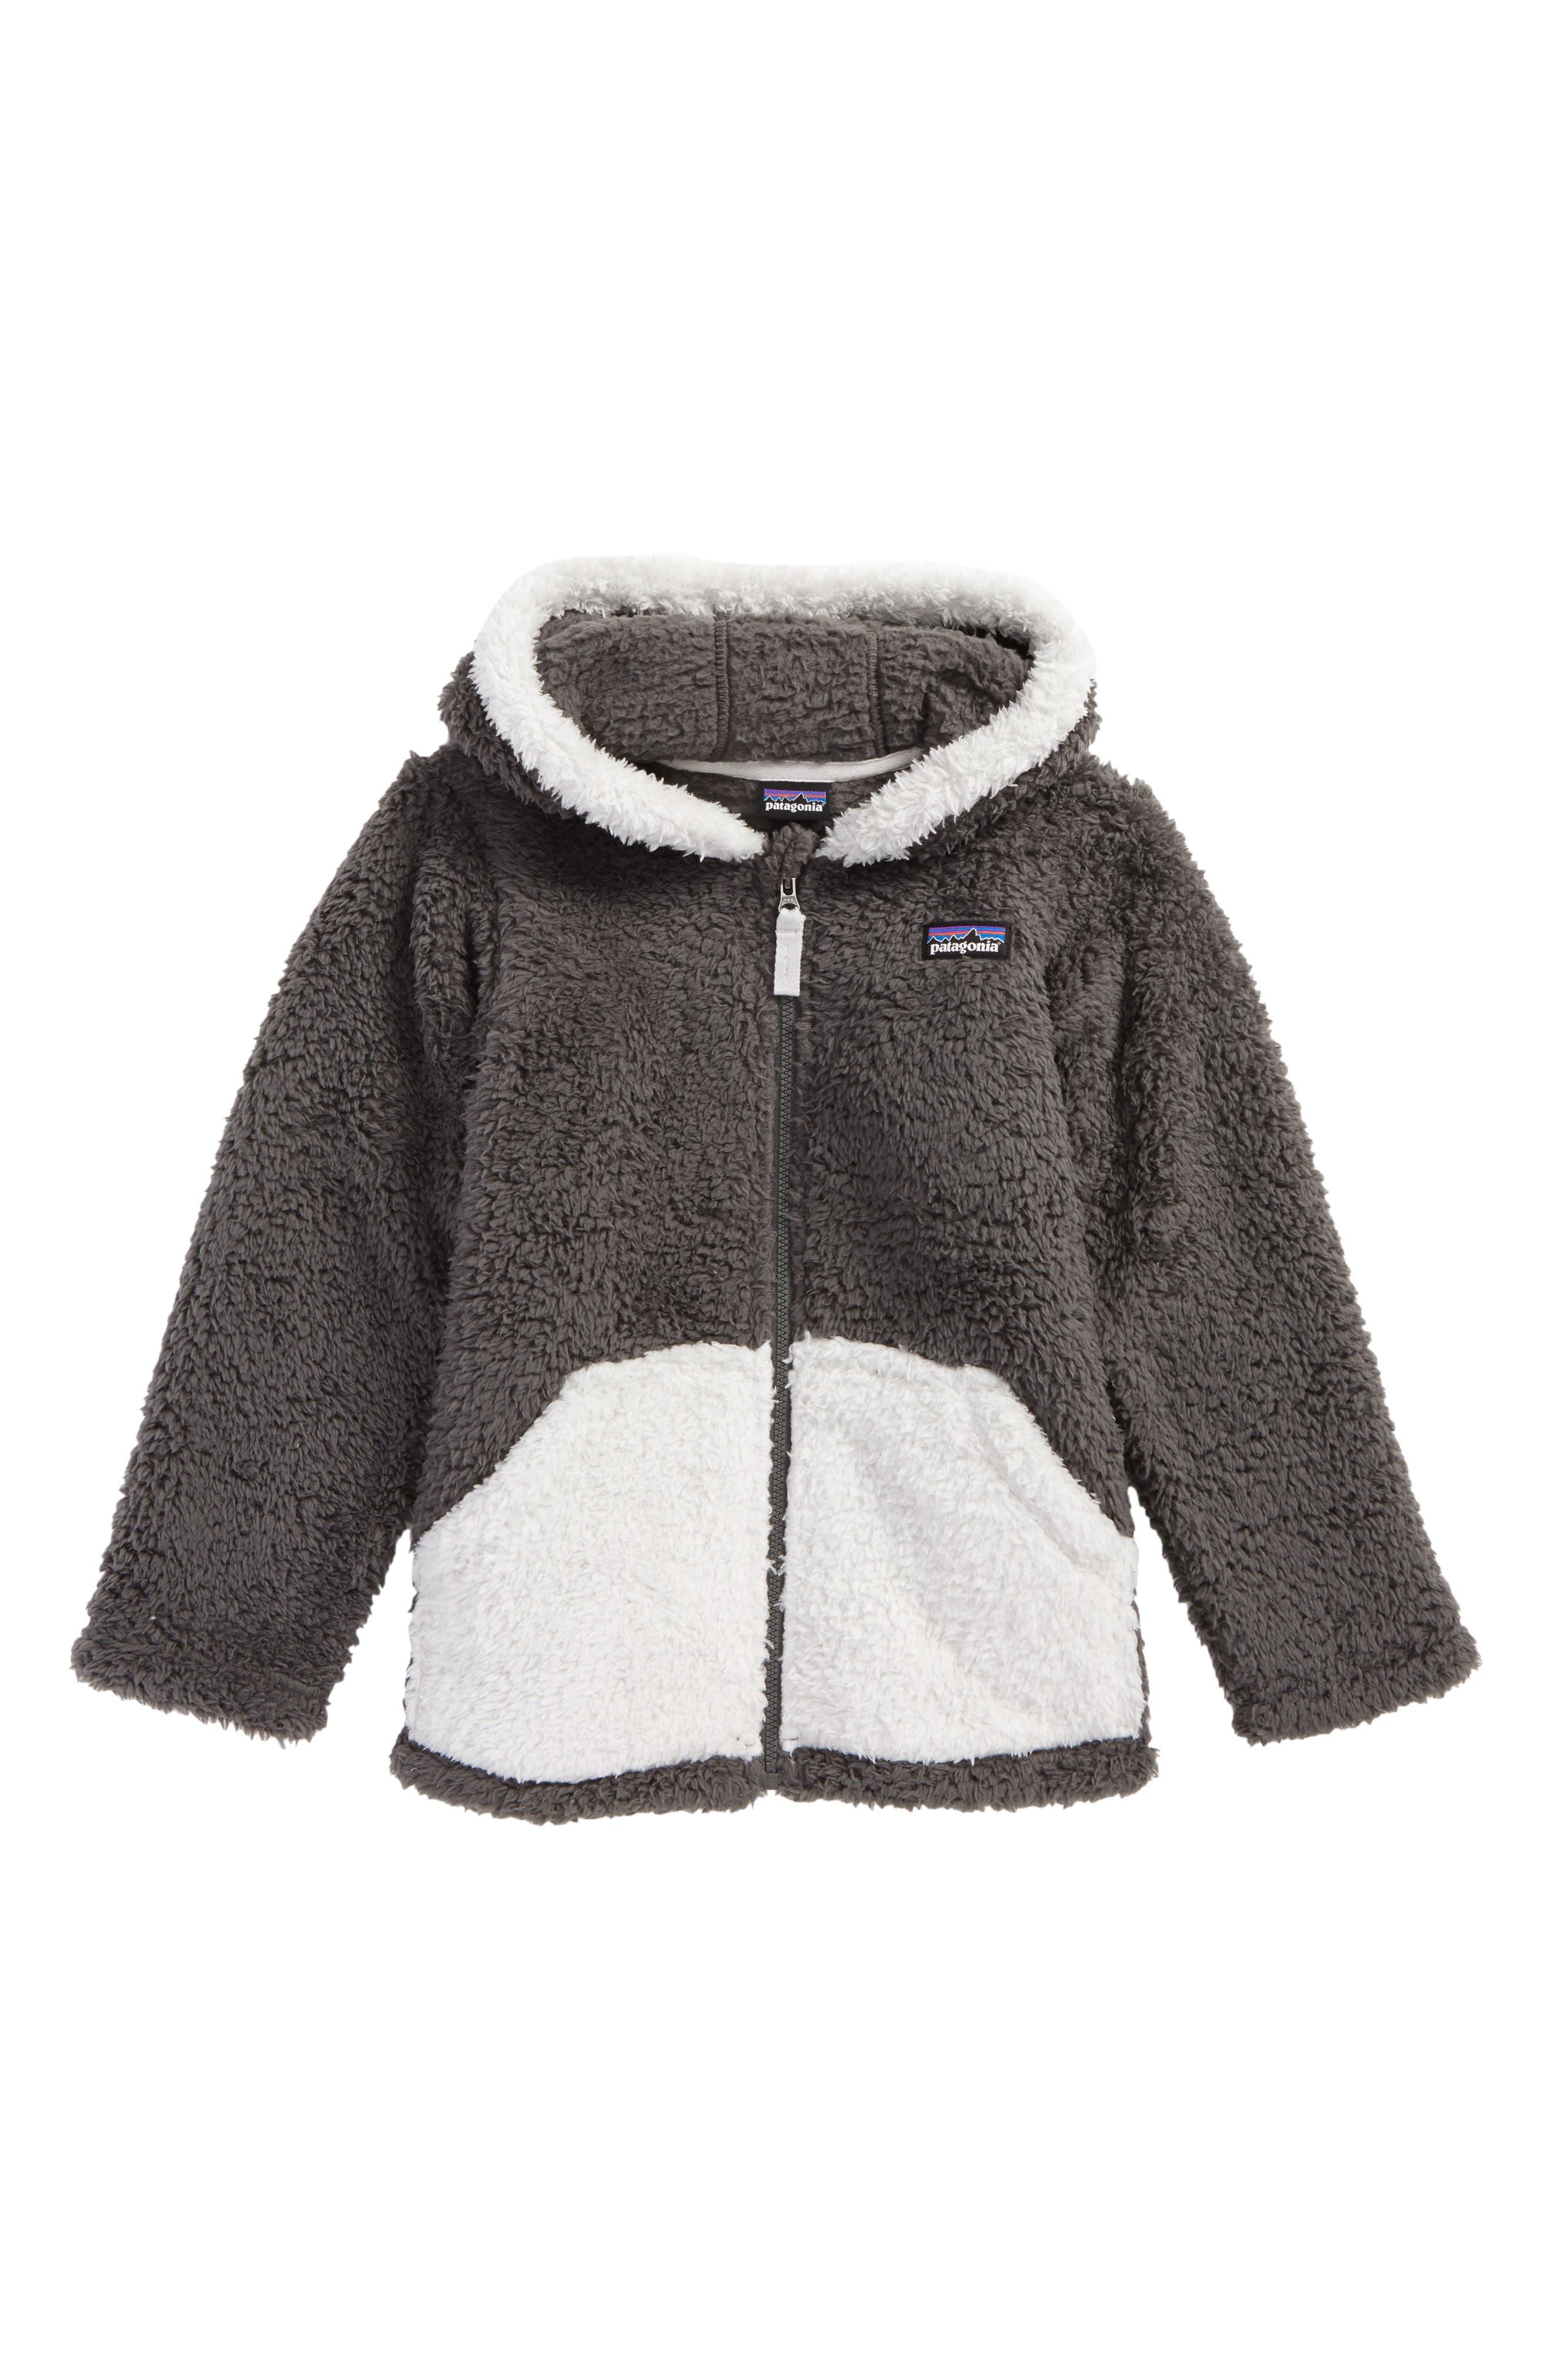 Main Image - Patagonia Furry Friends Zip Hoodie (Toddler Boys)